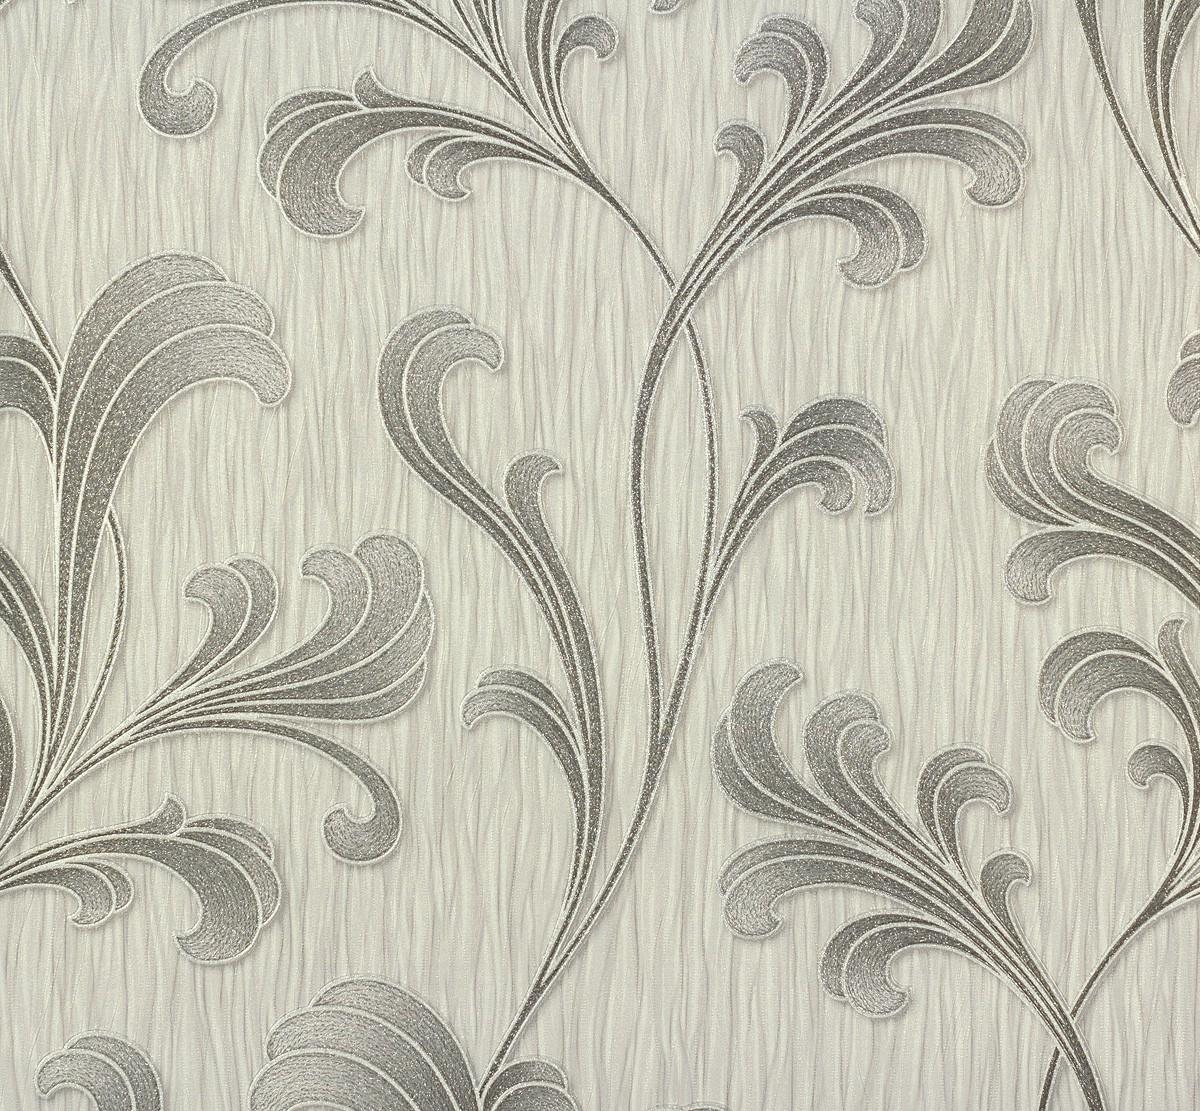 vliestapete floral ranken design grau silber tapete p s. Black Bedroom Furniture Sets. Home Design Ideas